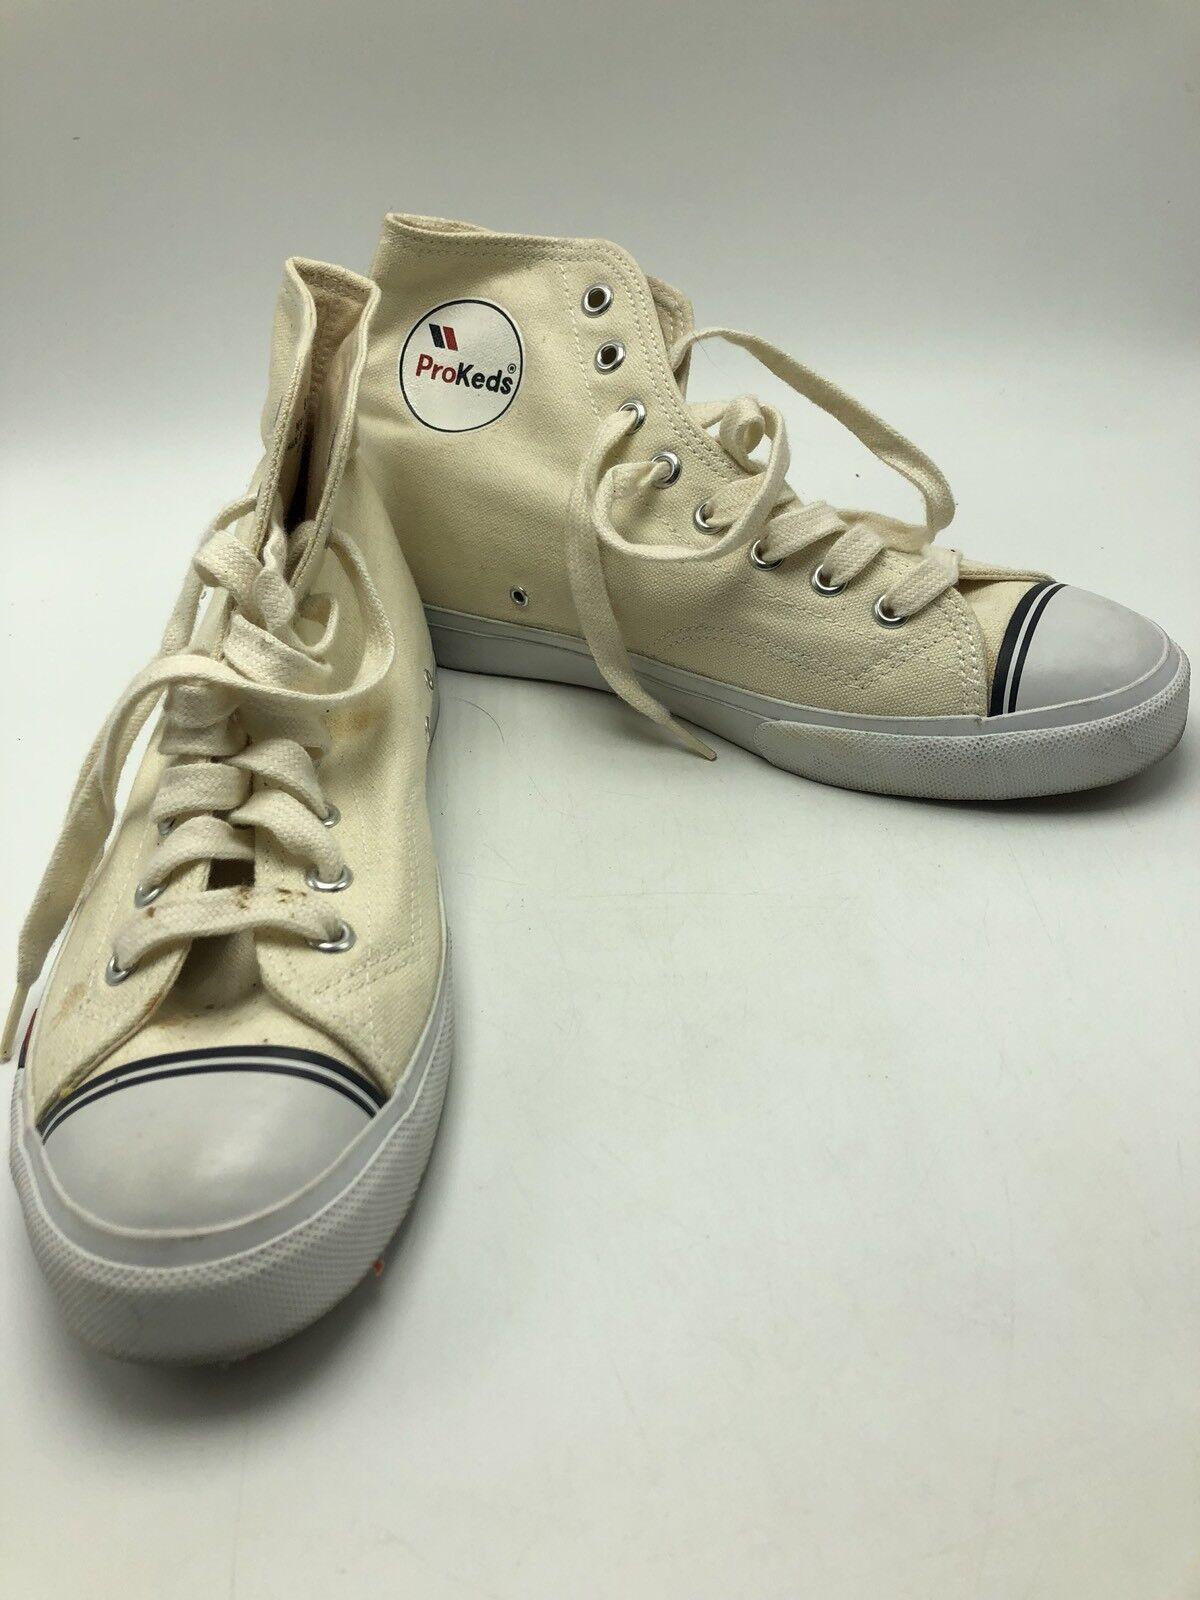 Pro Keds High Top White Canvas shoes Mens 8M